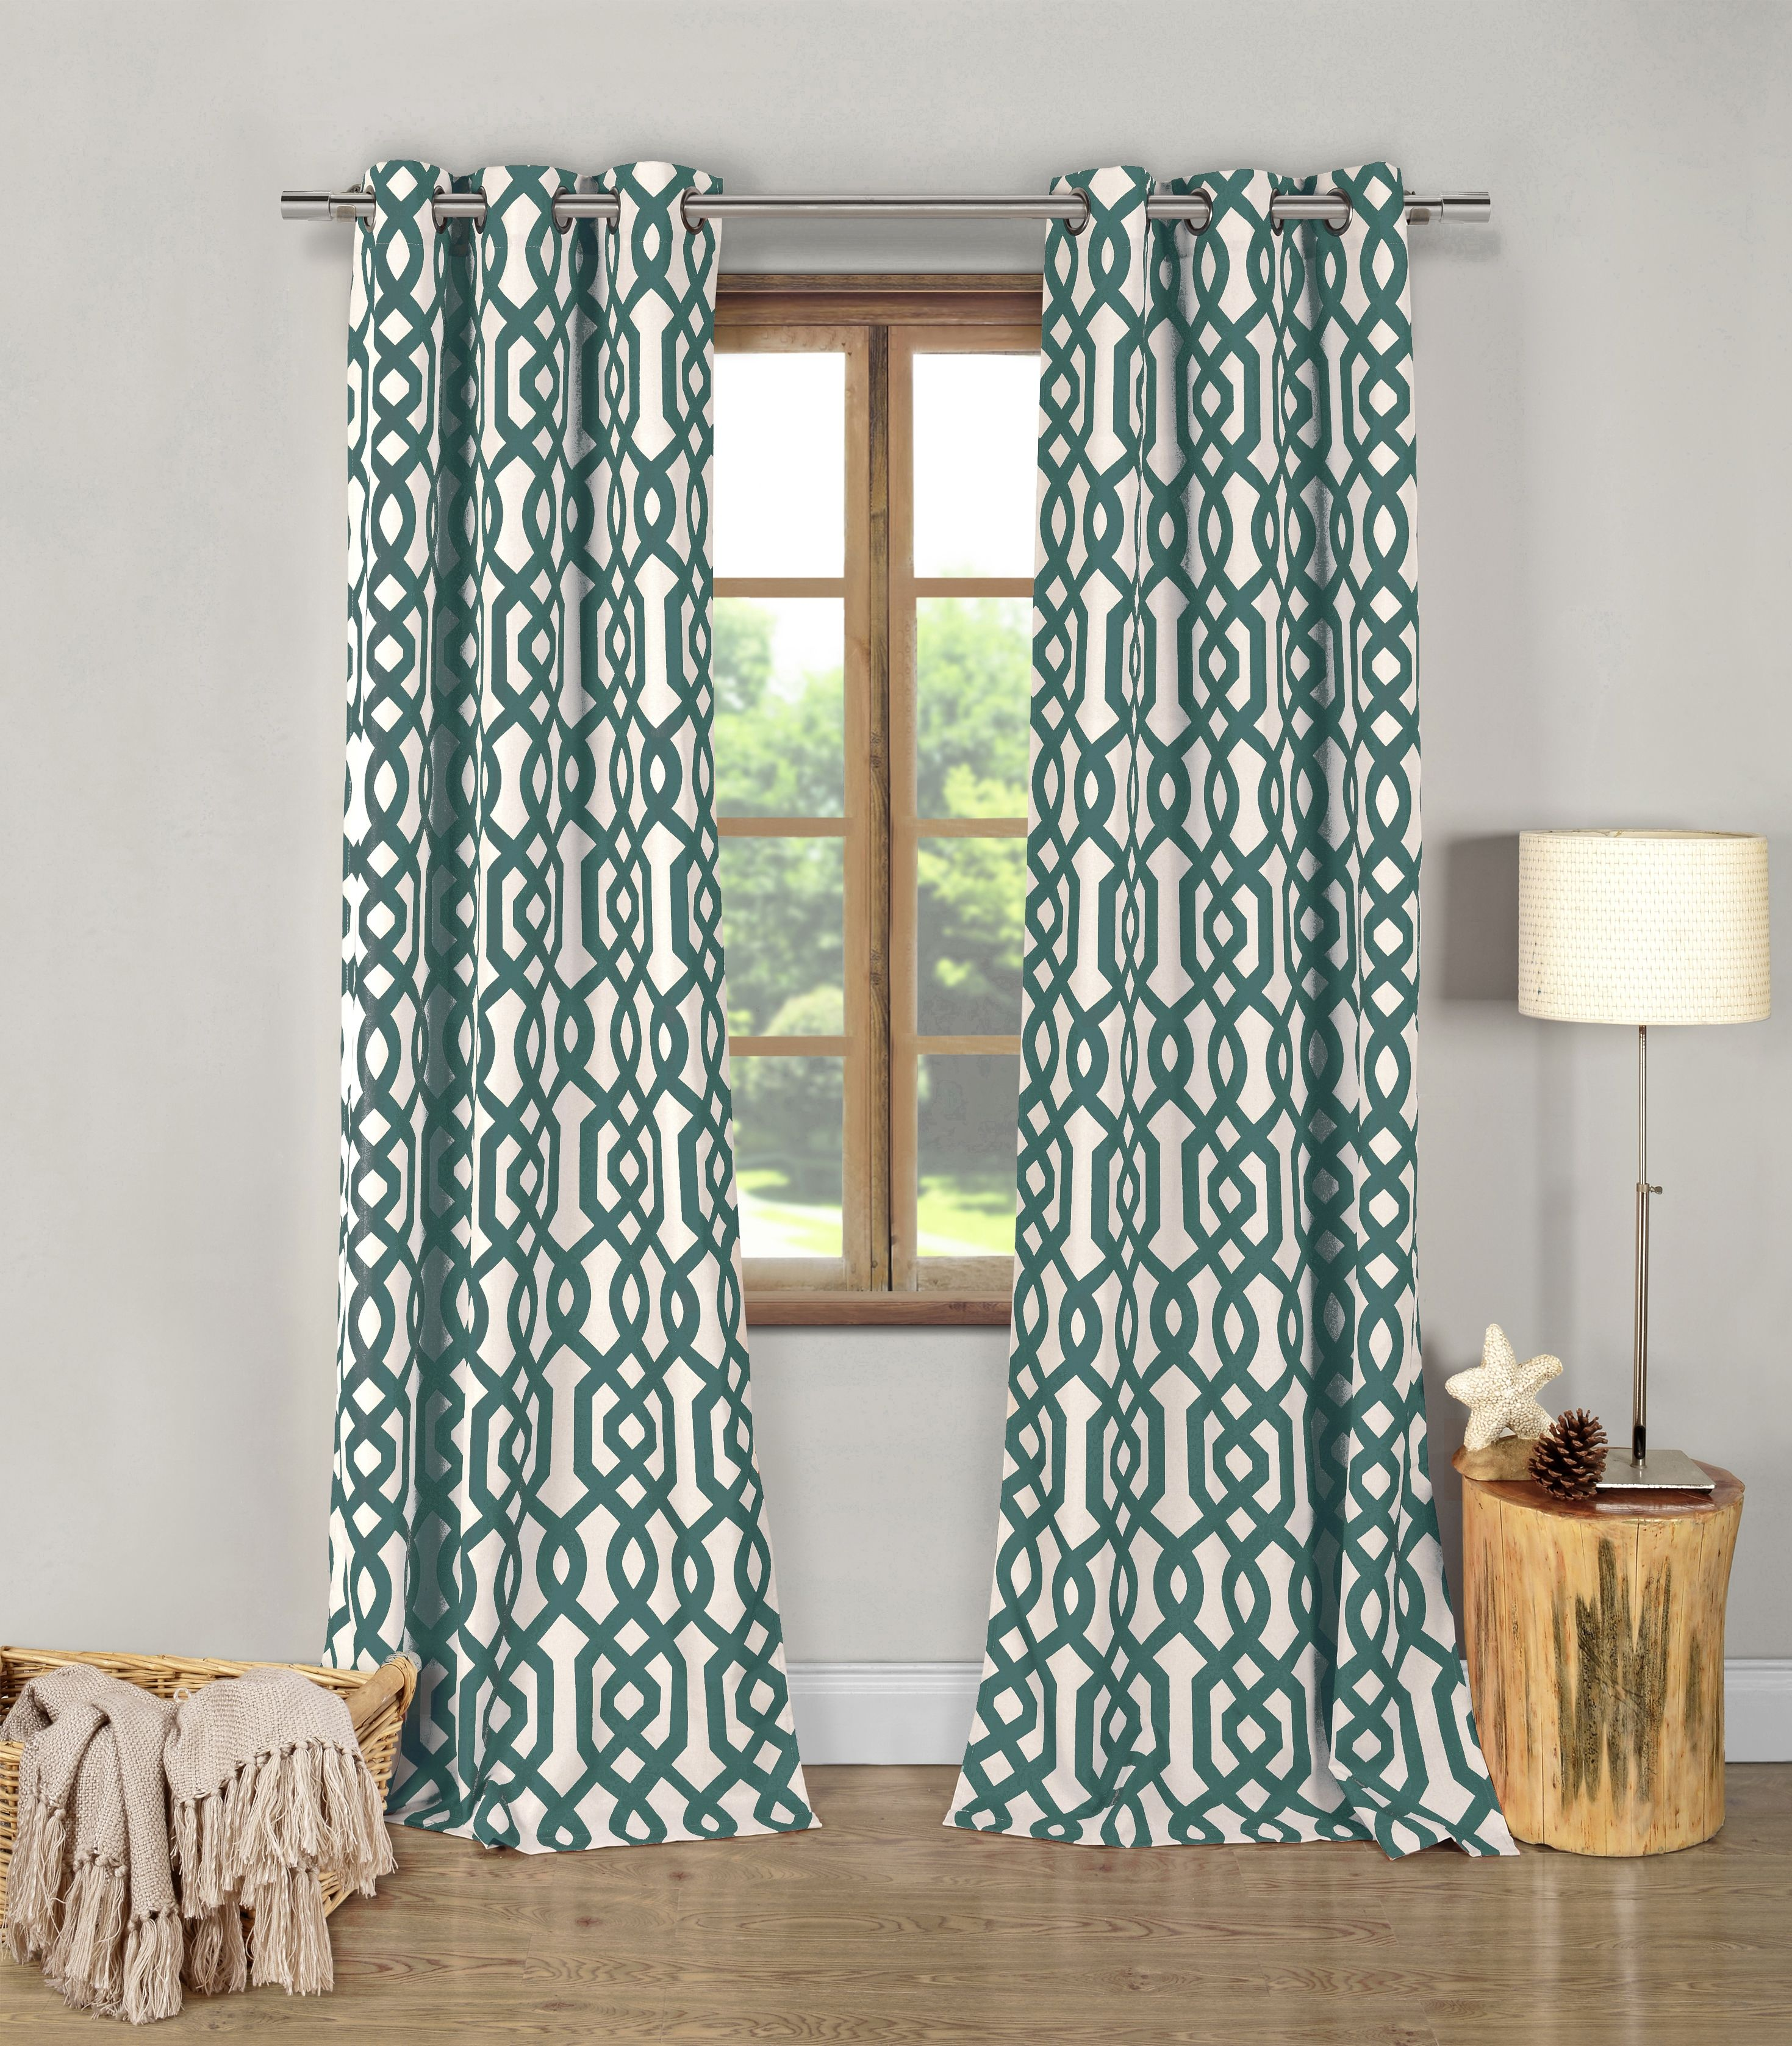 Green geometric window curtains realtagfo pinterest